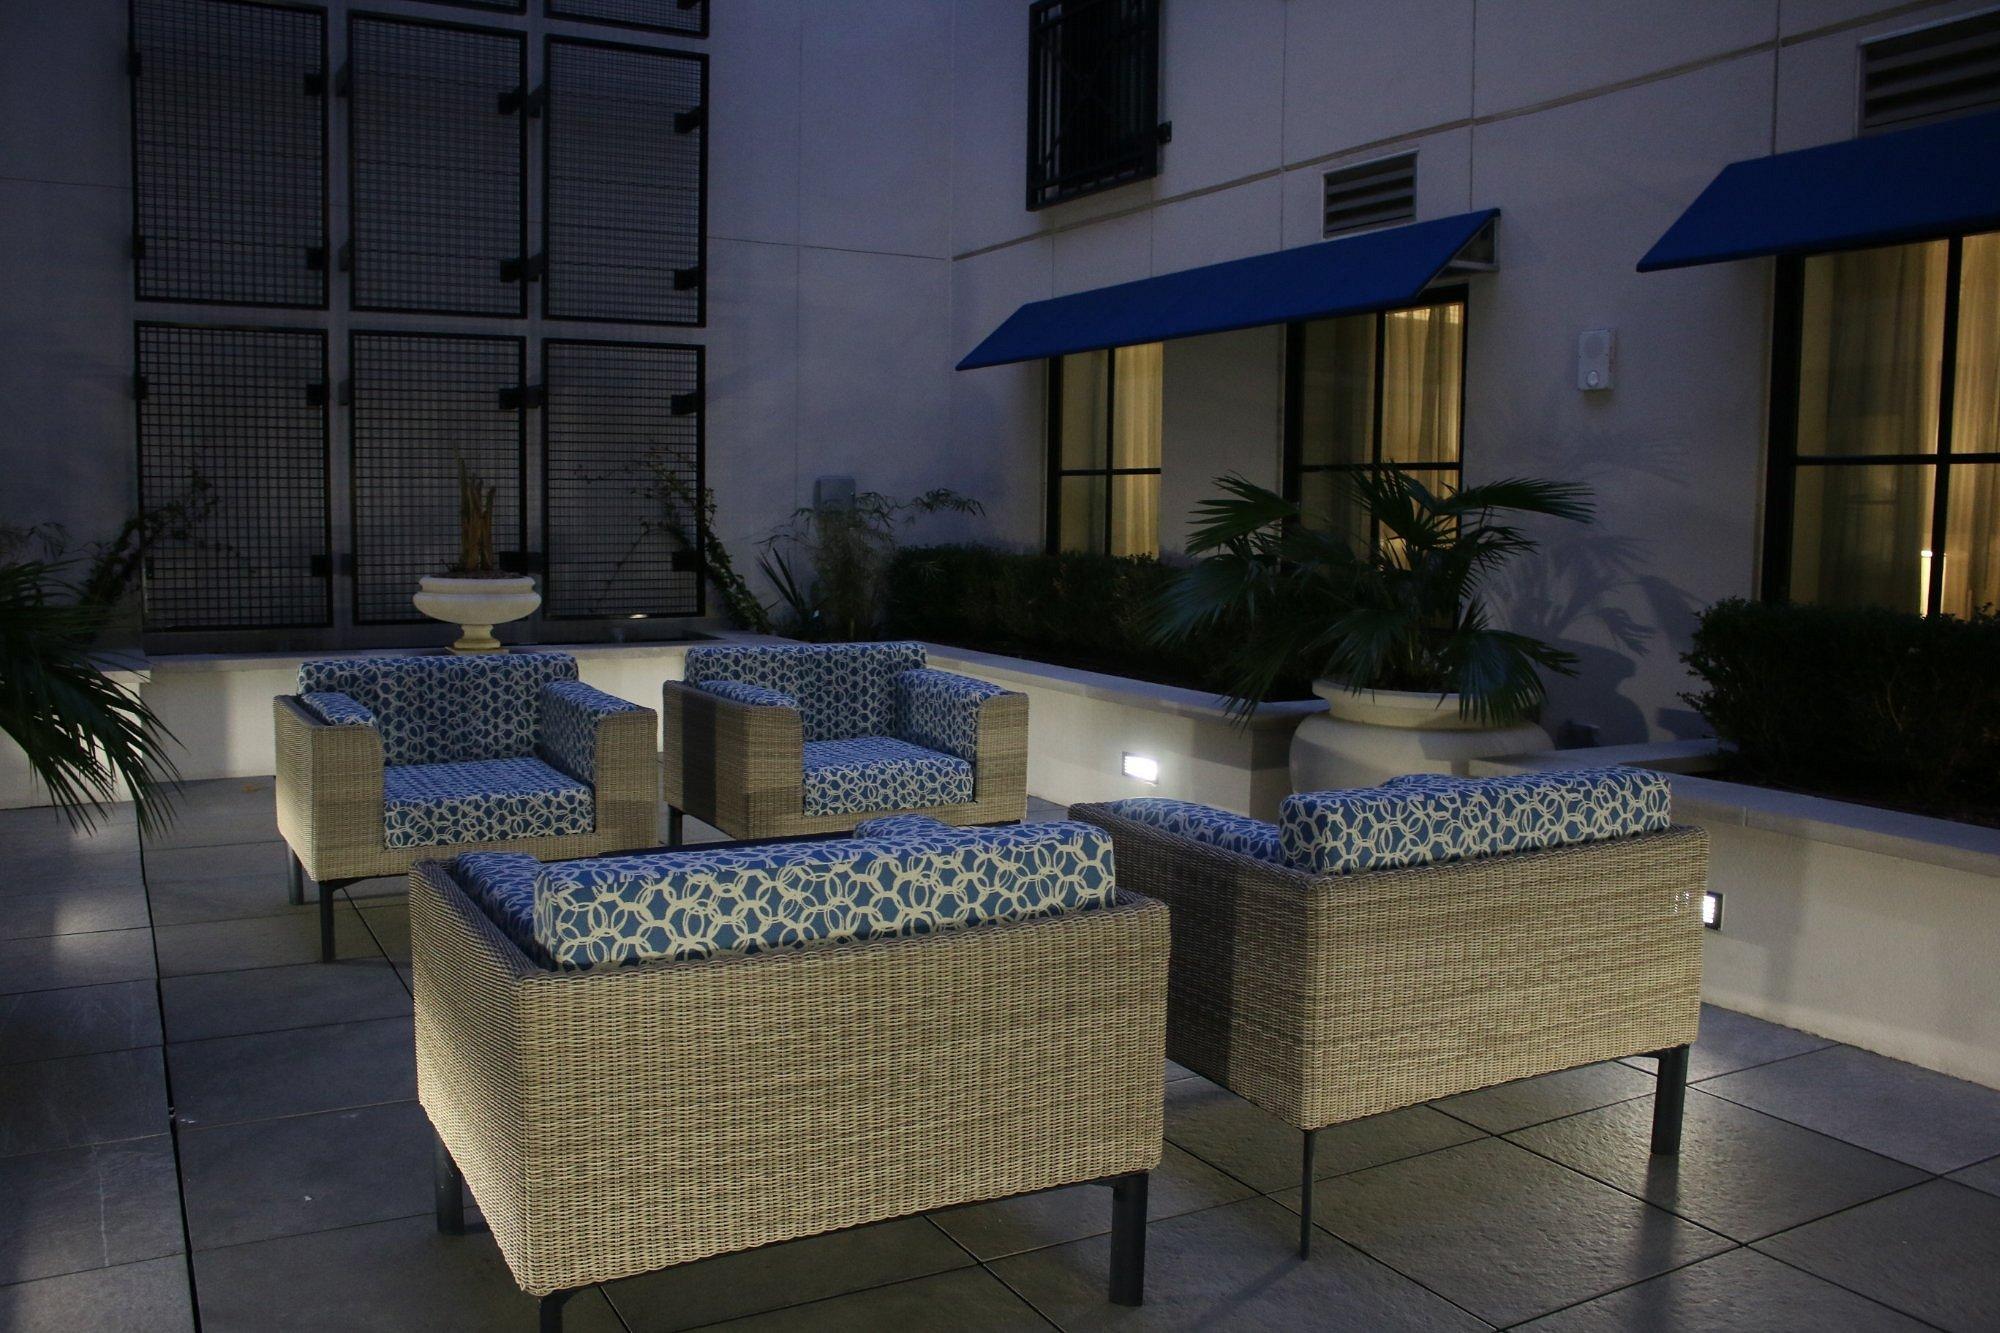 Bluegreen_Vacations_King_Street_Resort_Outdoor_Seating_29b4494e9c.jpg